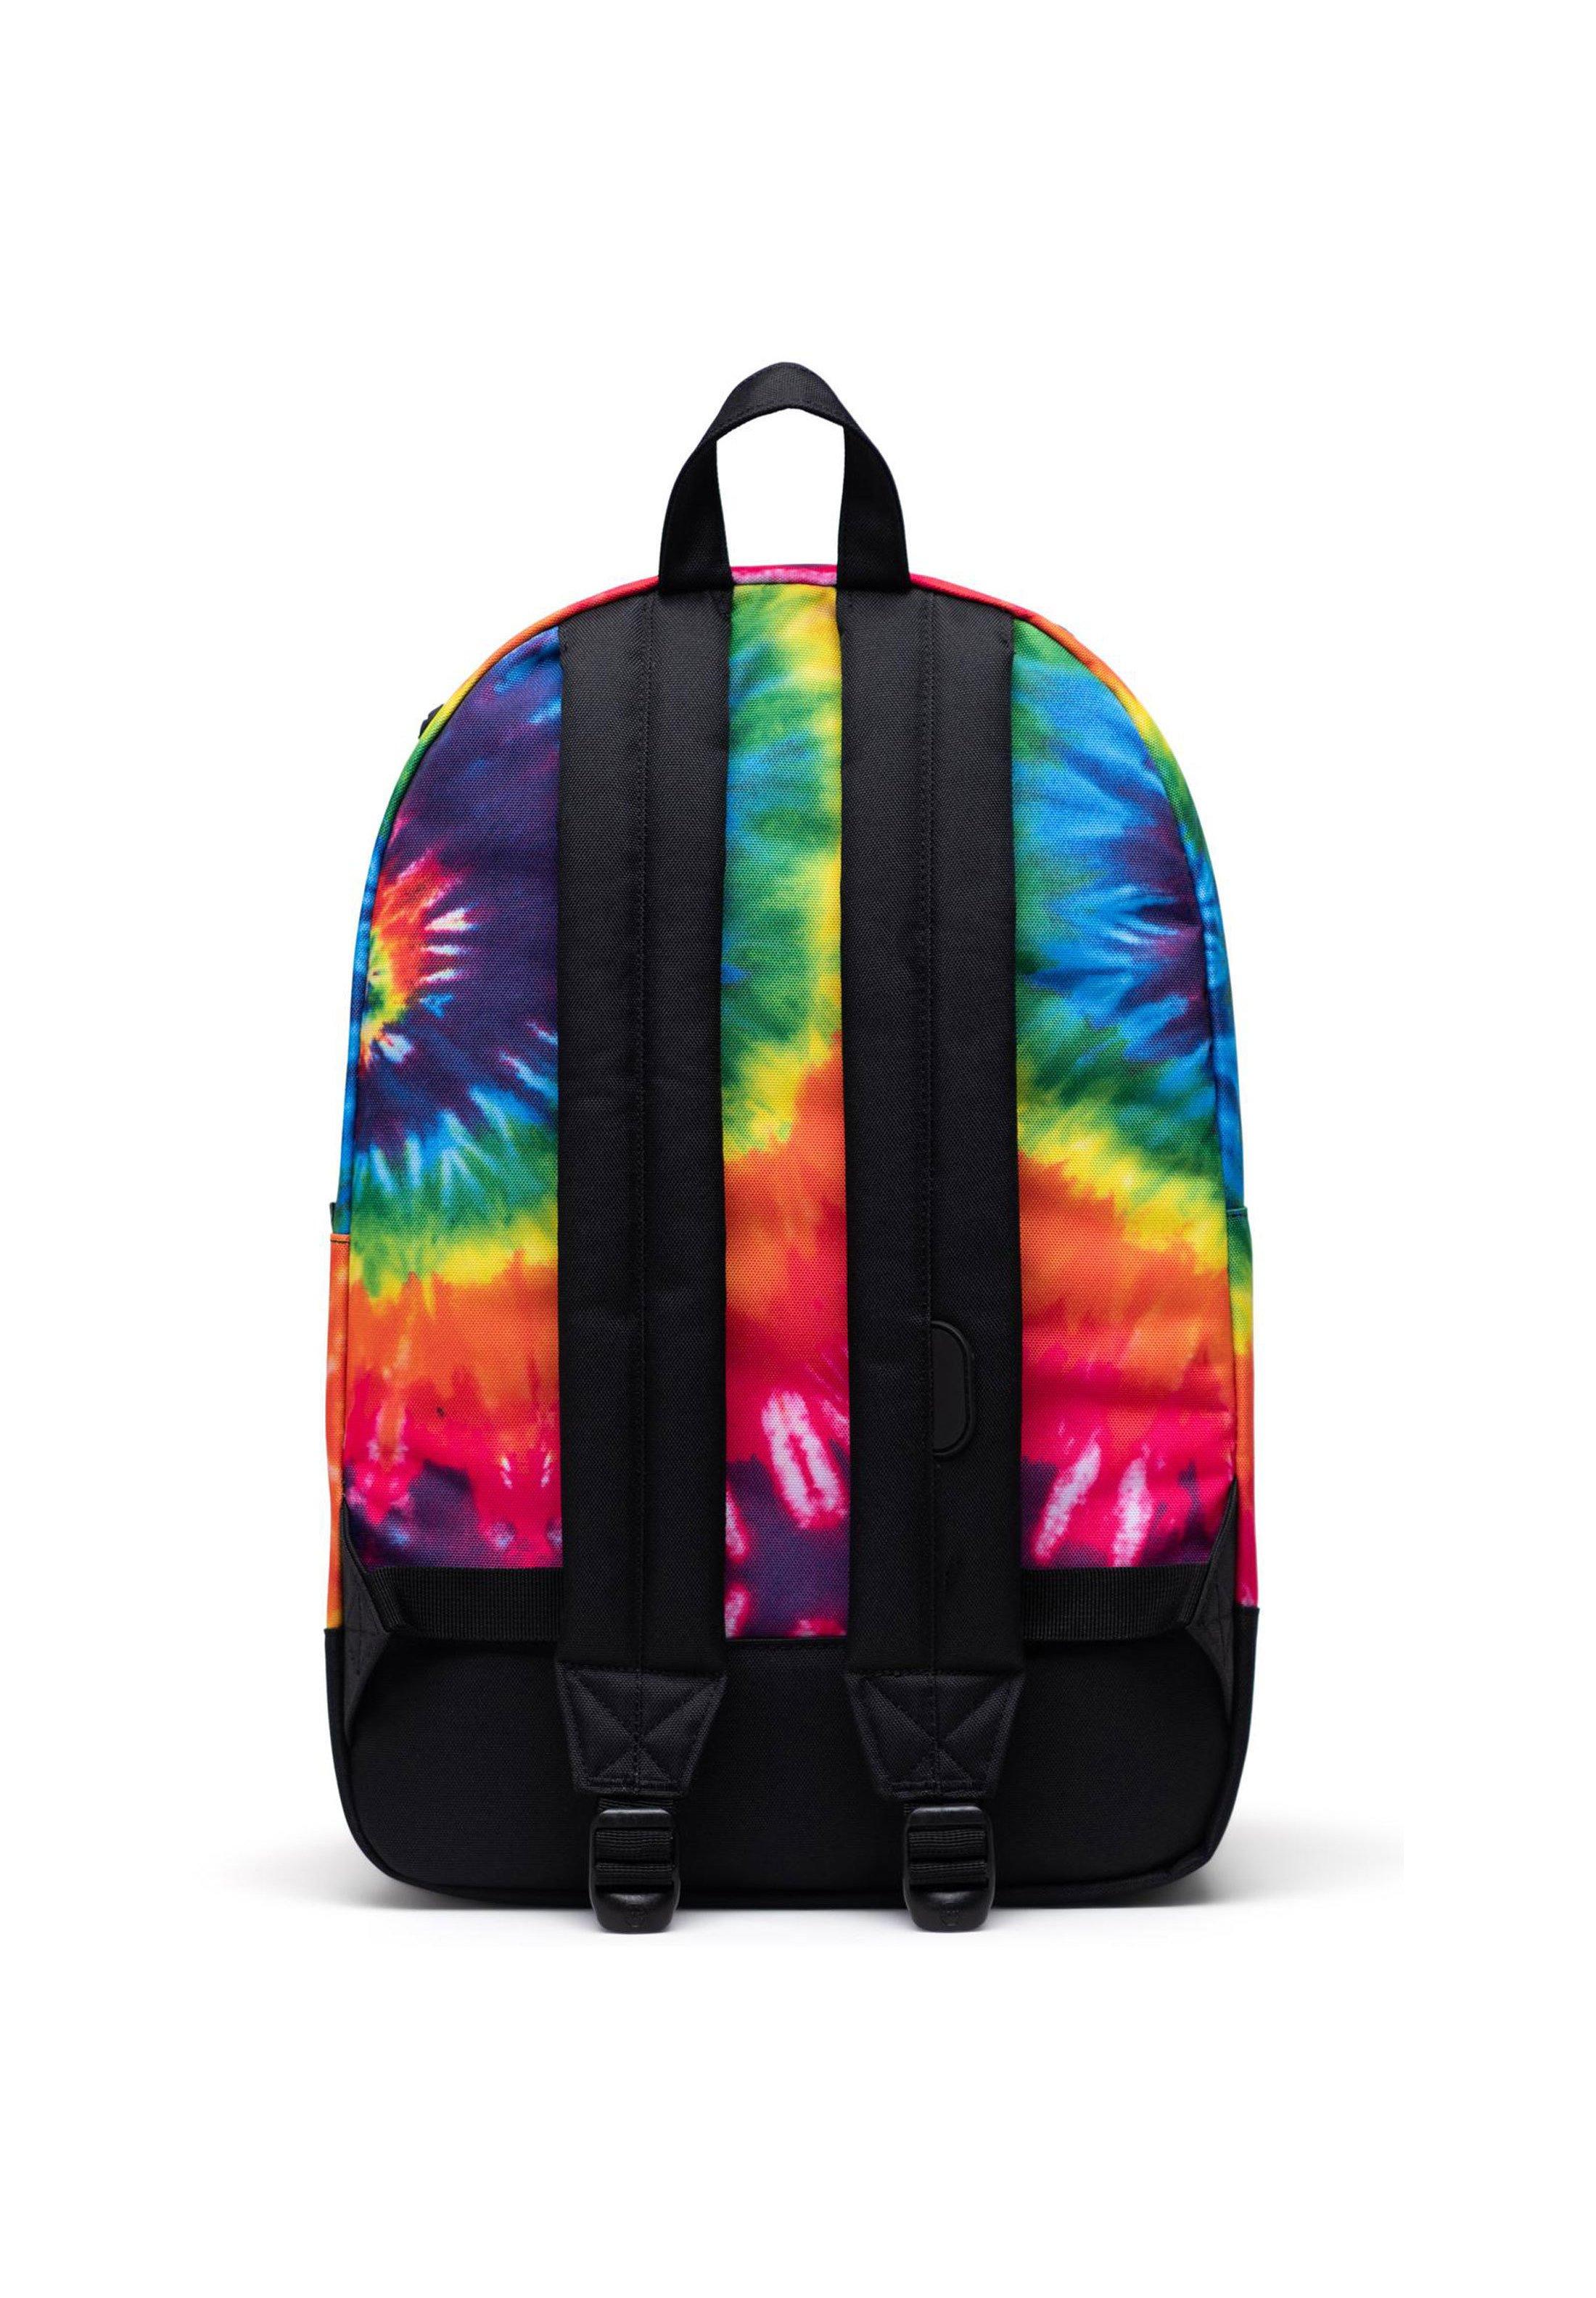 Herschel Heritage Rucksack - Zaino Rainbow Tie Dye